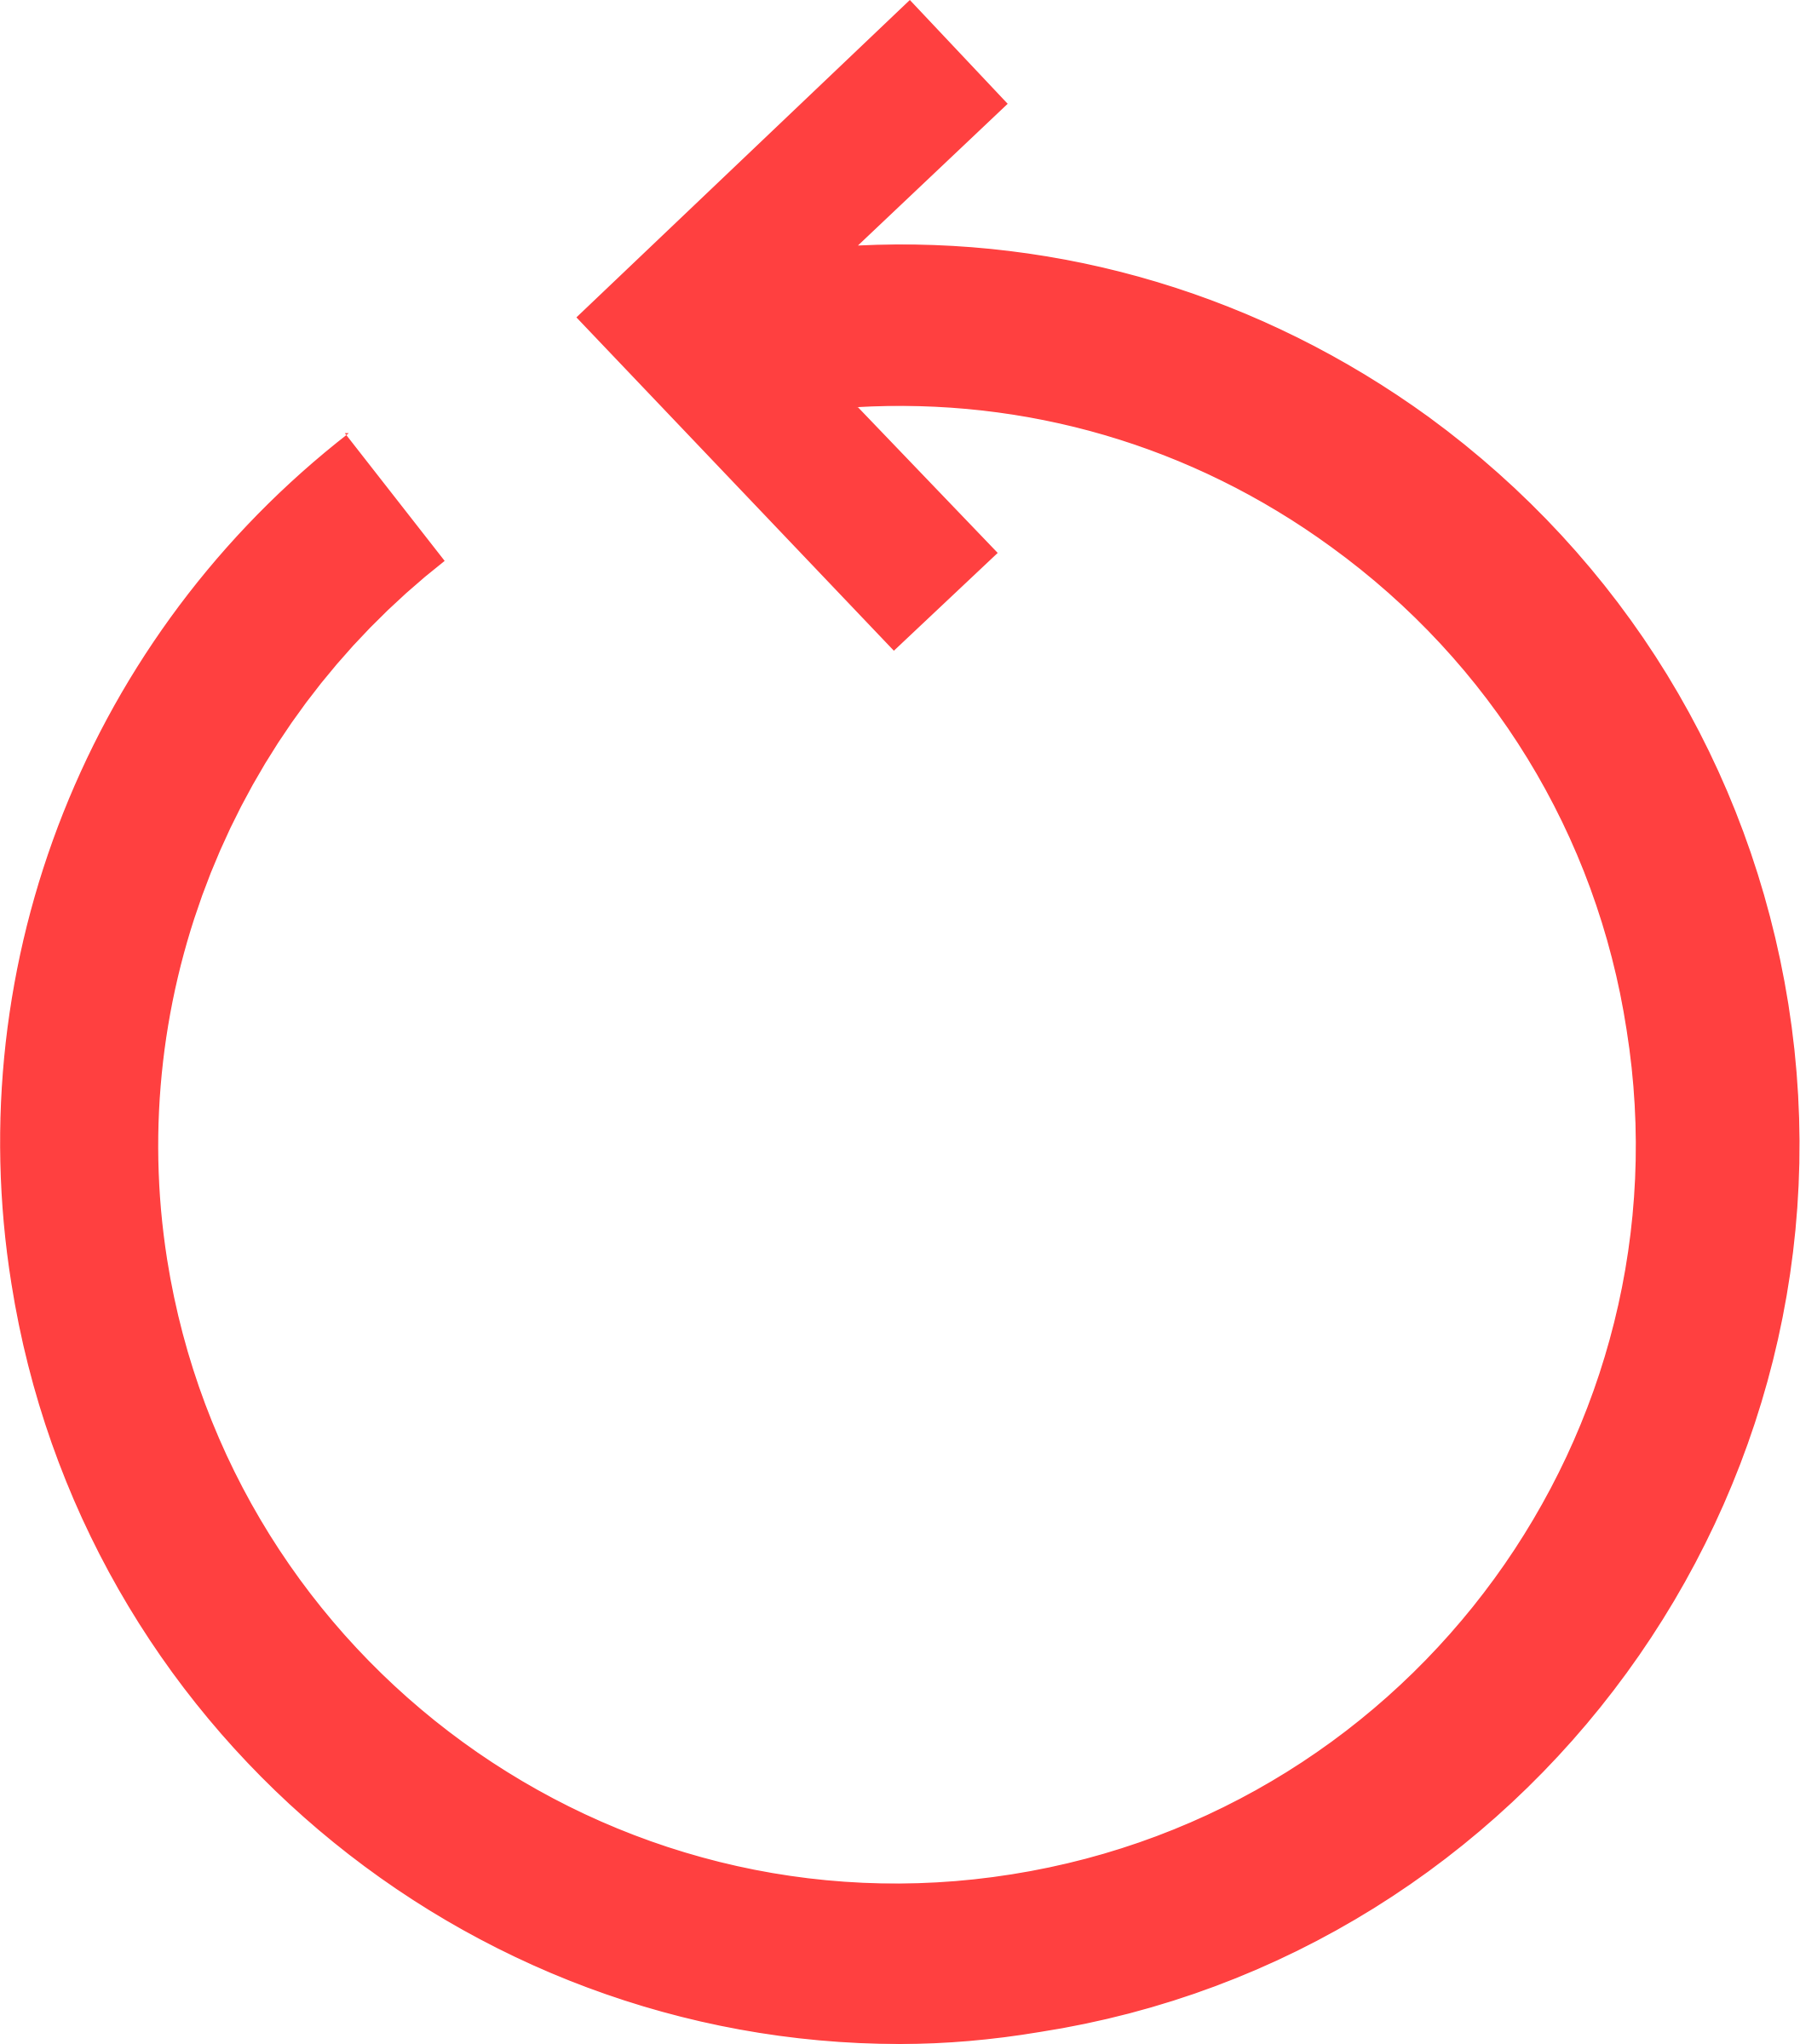 Free clip art arrow circle png royalty free Clipart - circular arrow (red) png royalty free